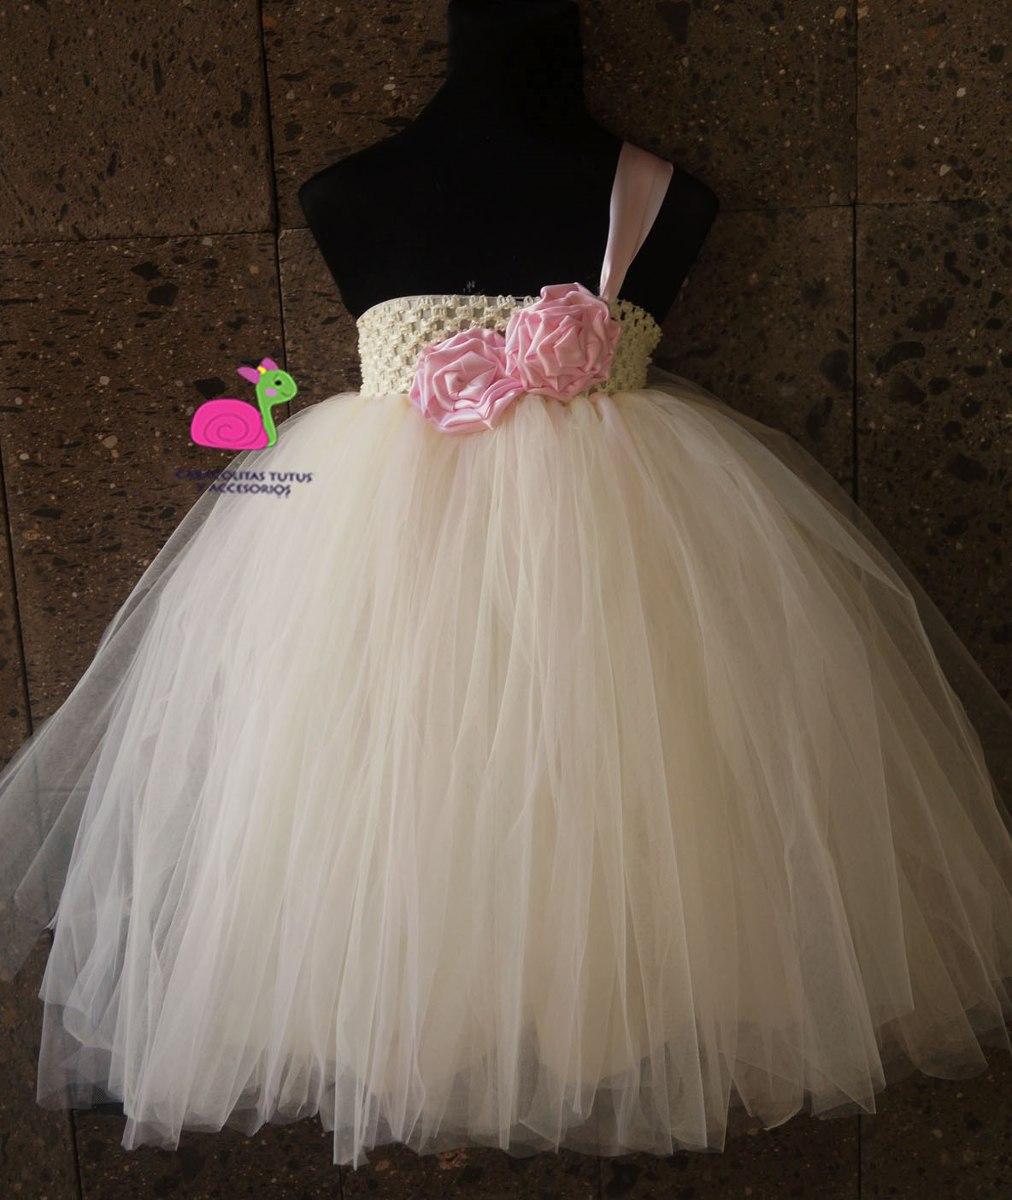 84b4ff3da Tutus Tutu Dress Para Pajesitas Bodas Bautizo -   800.00 en Mercado ...